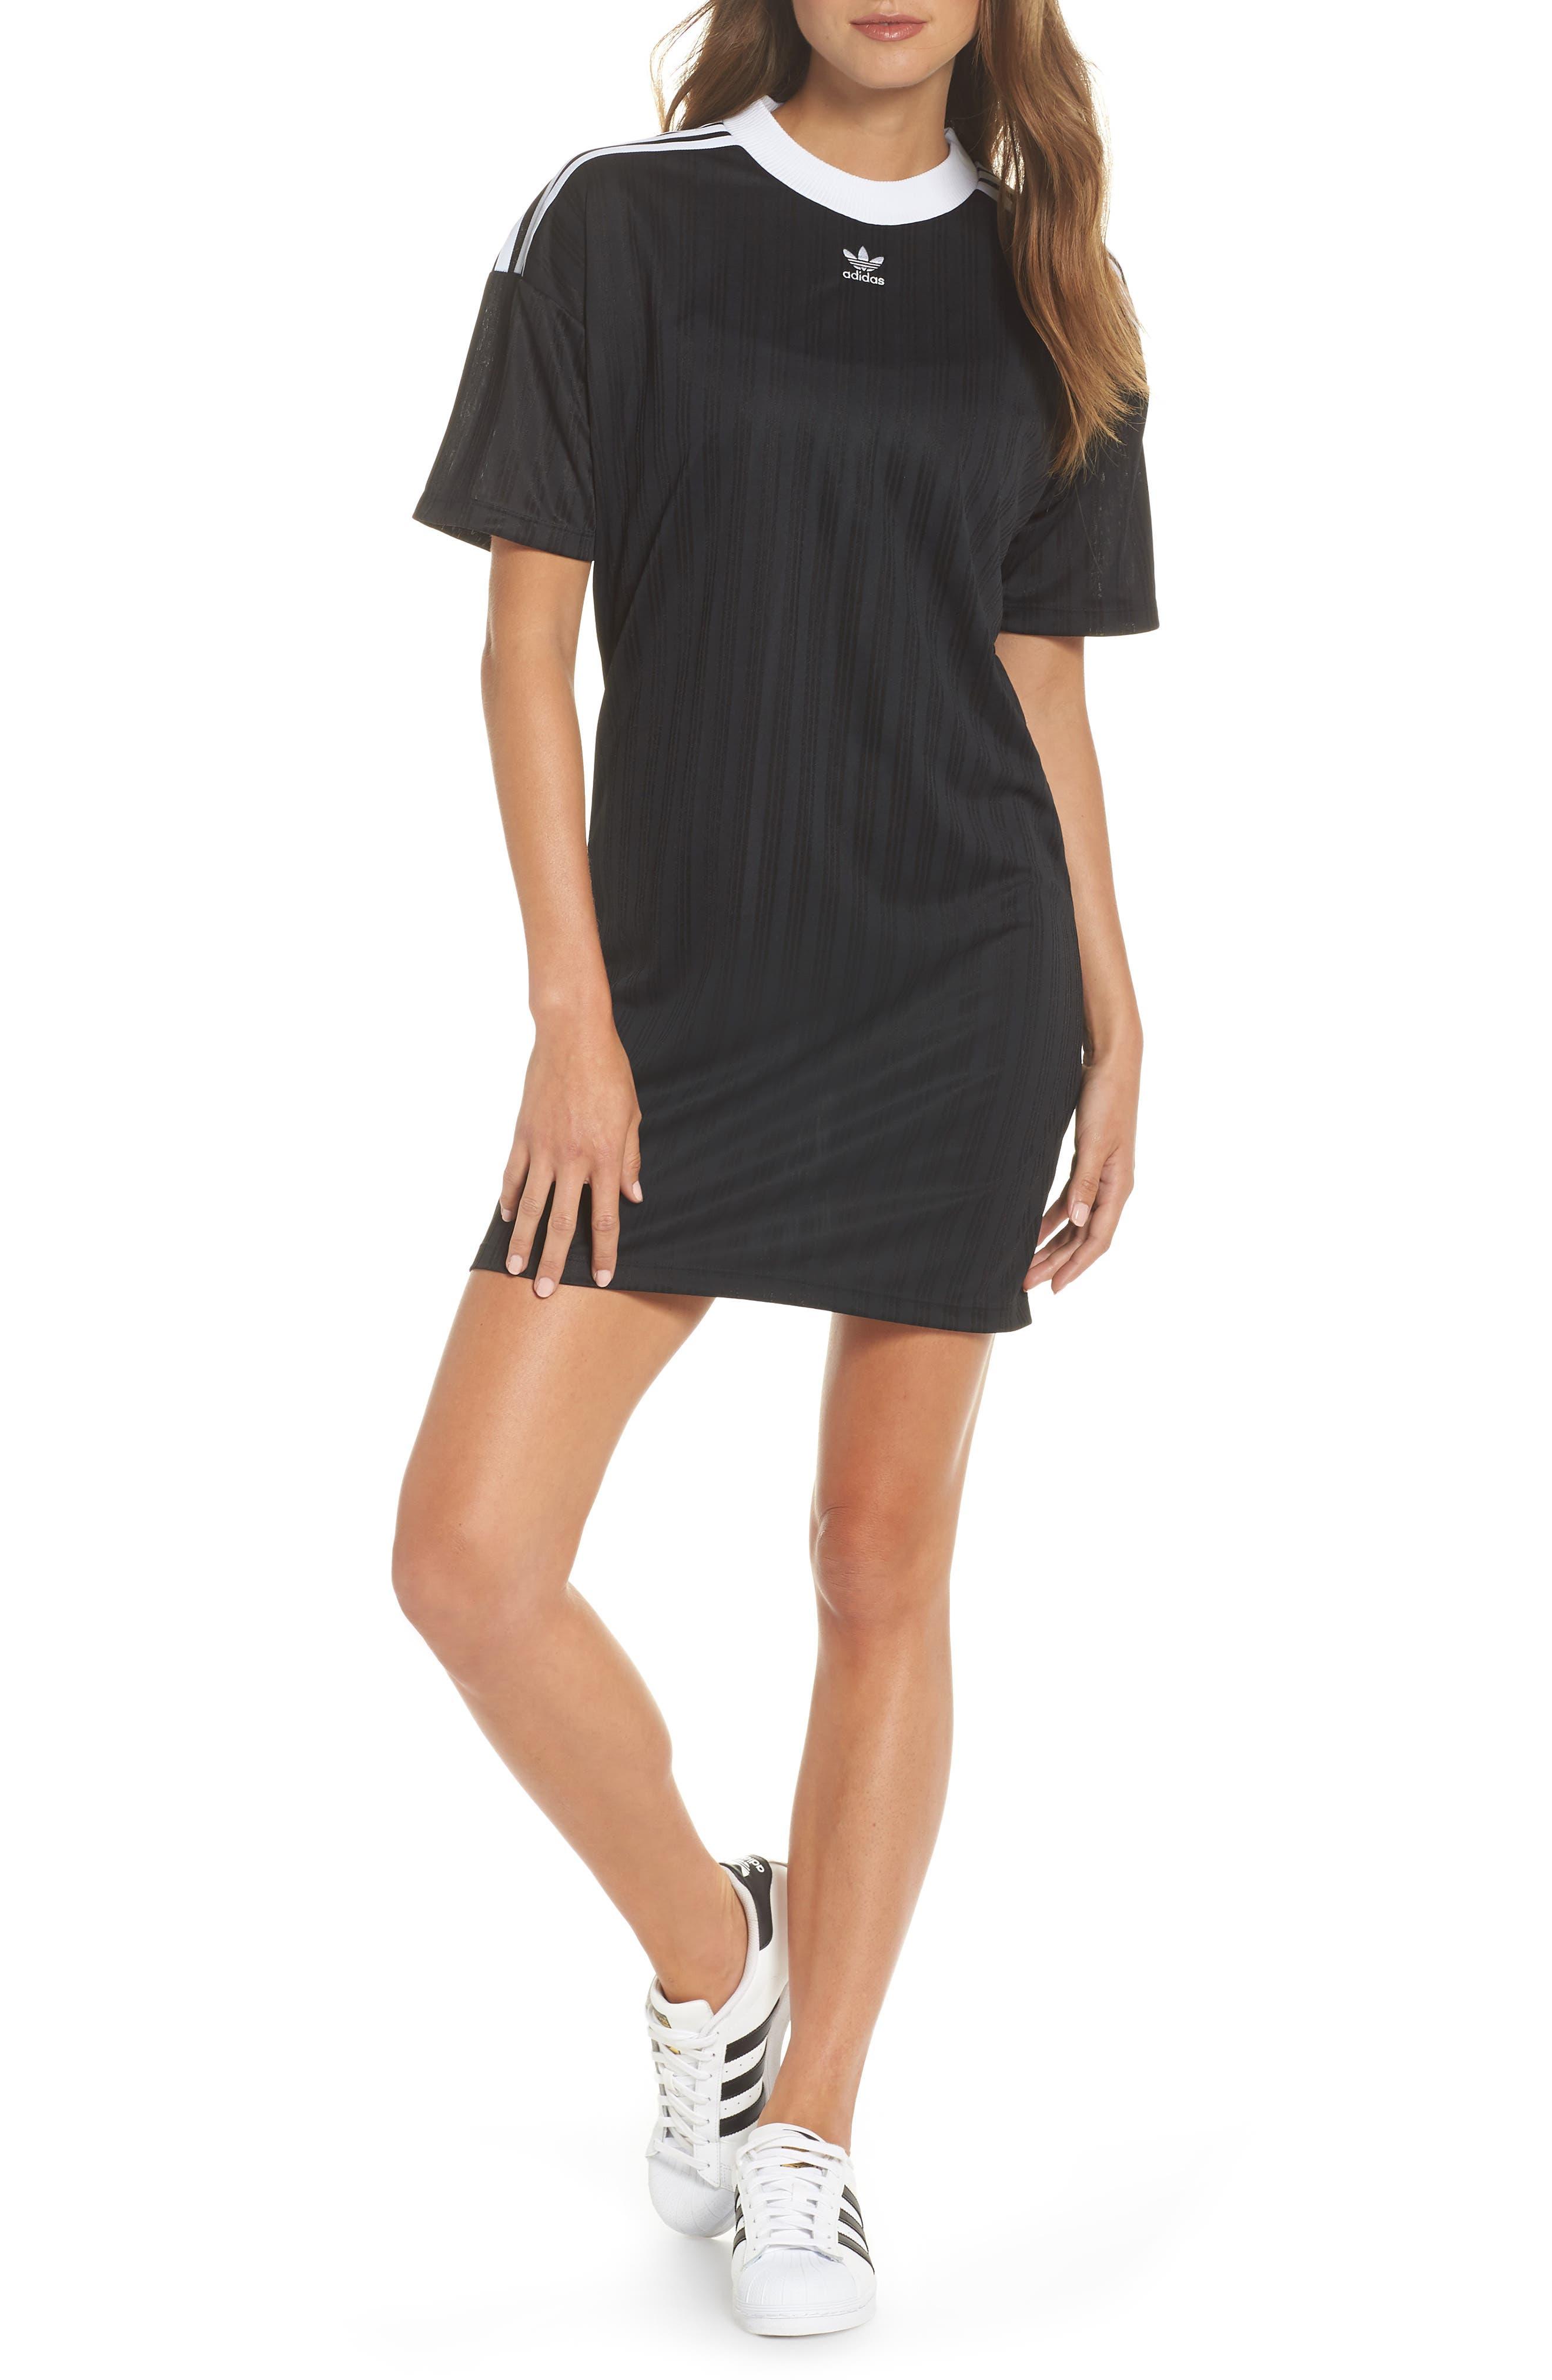 ADIDAS ORIGINALS Trefoil T-Shirt Dress, Main, color, 001